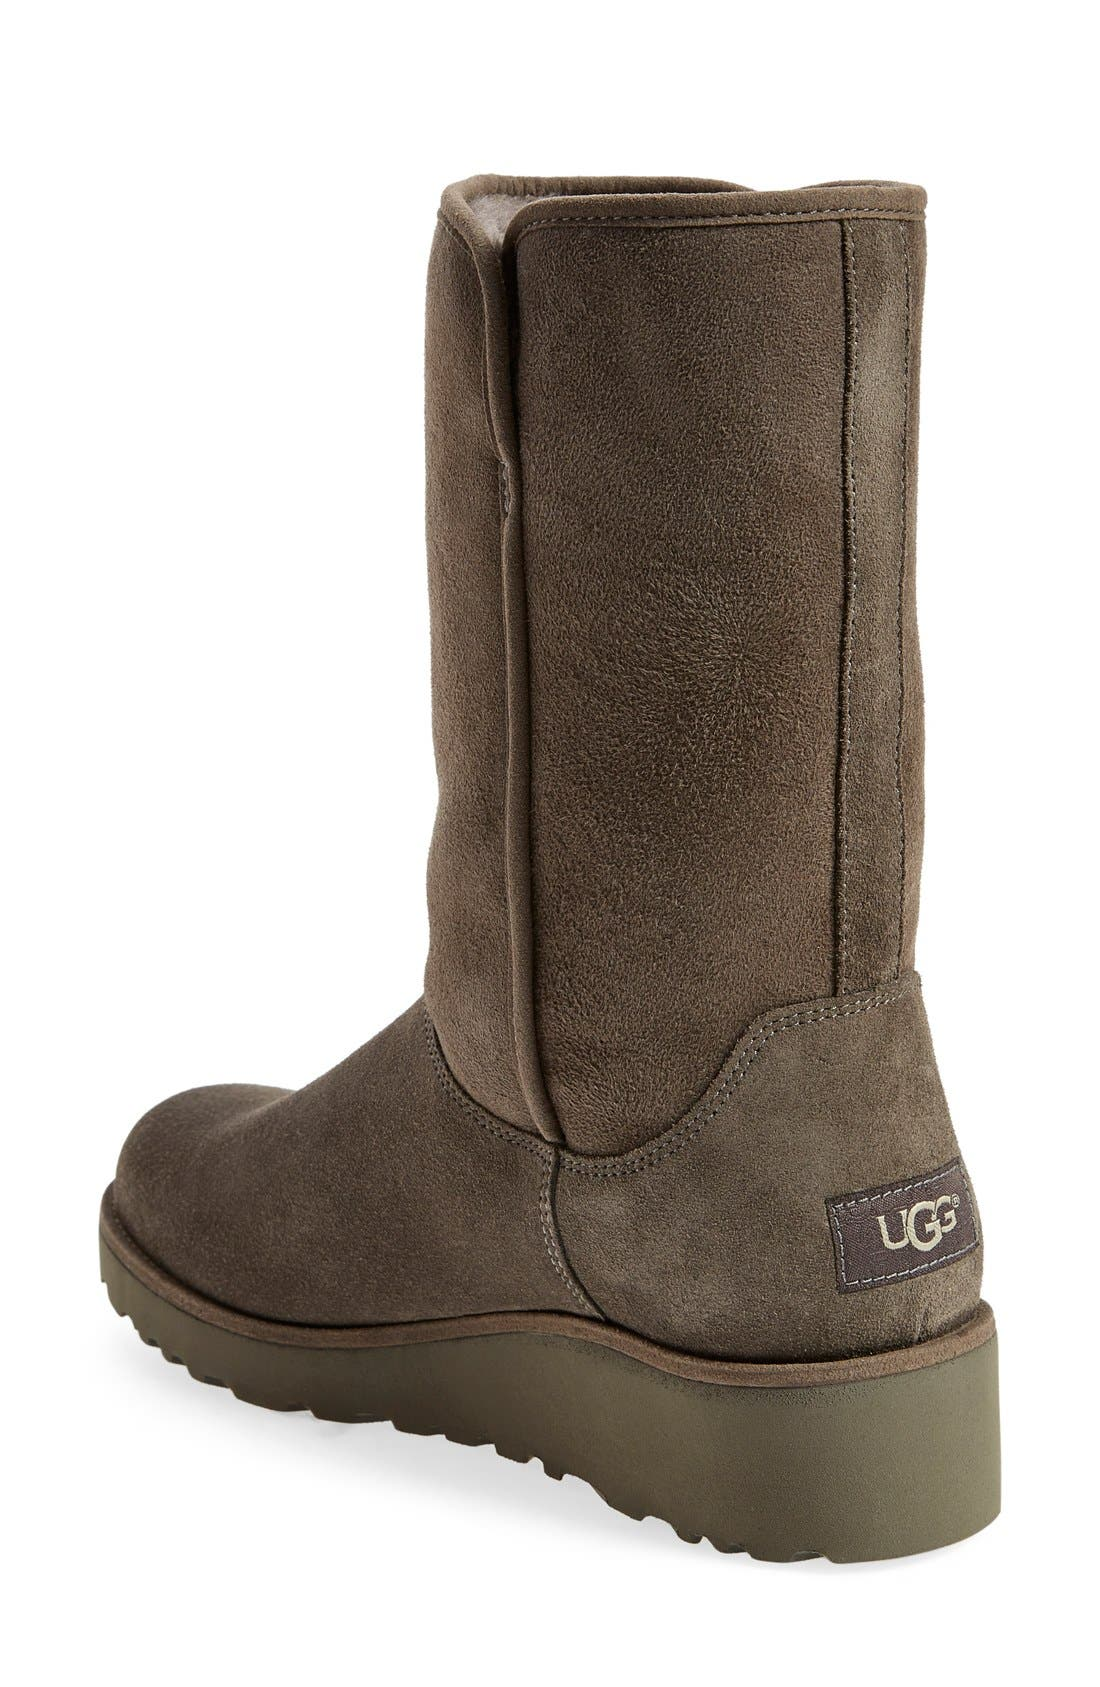 Alternate Image 2  - UGG® Amie - Classic Slim™ Water Resistant Short Boot (Women)